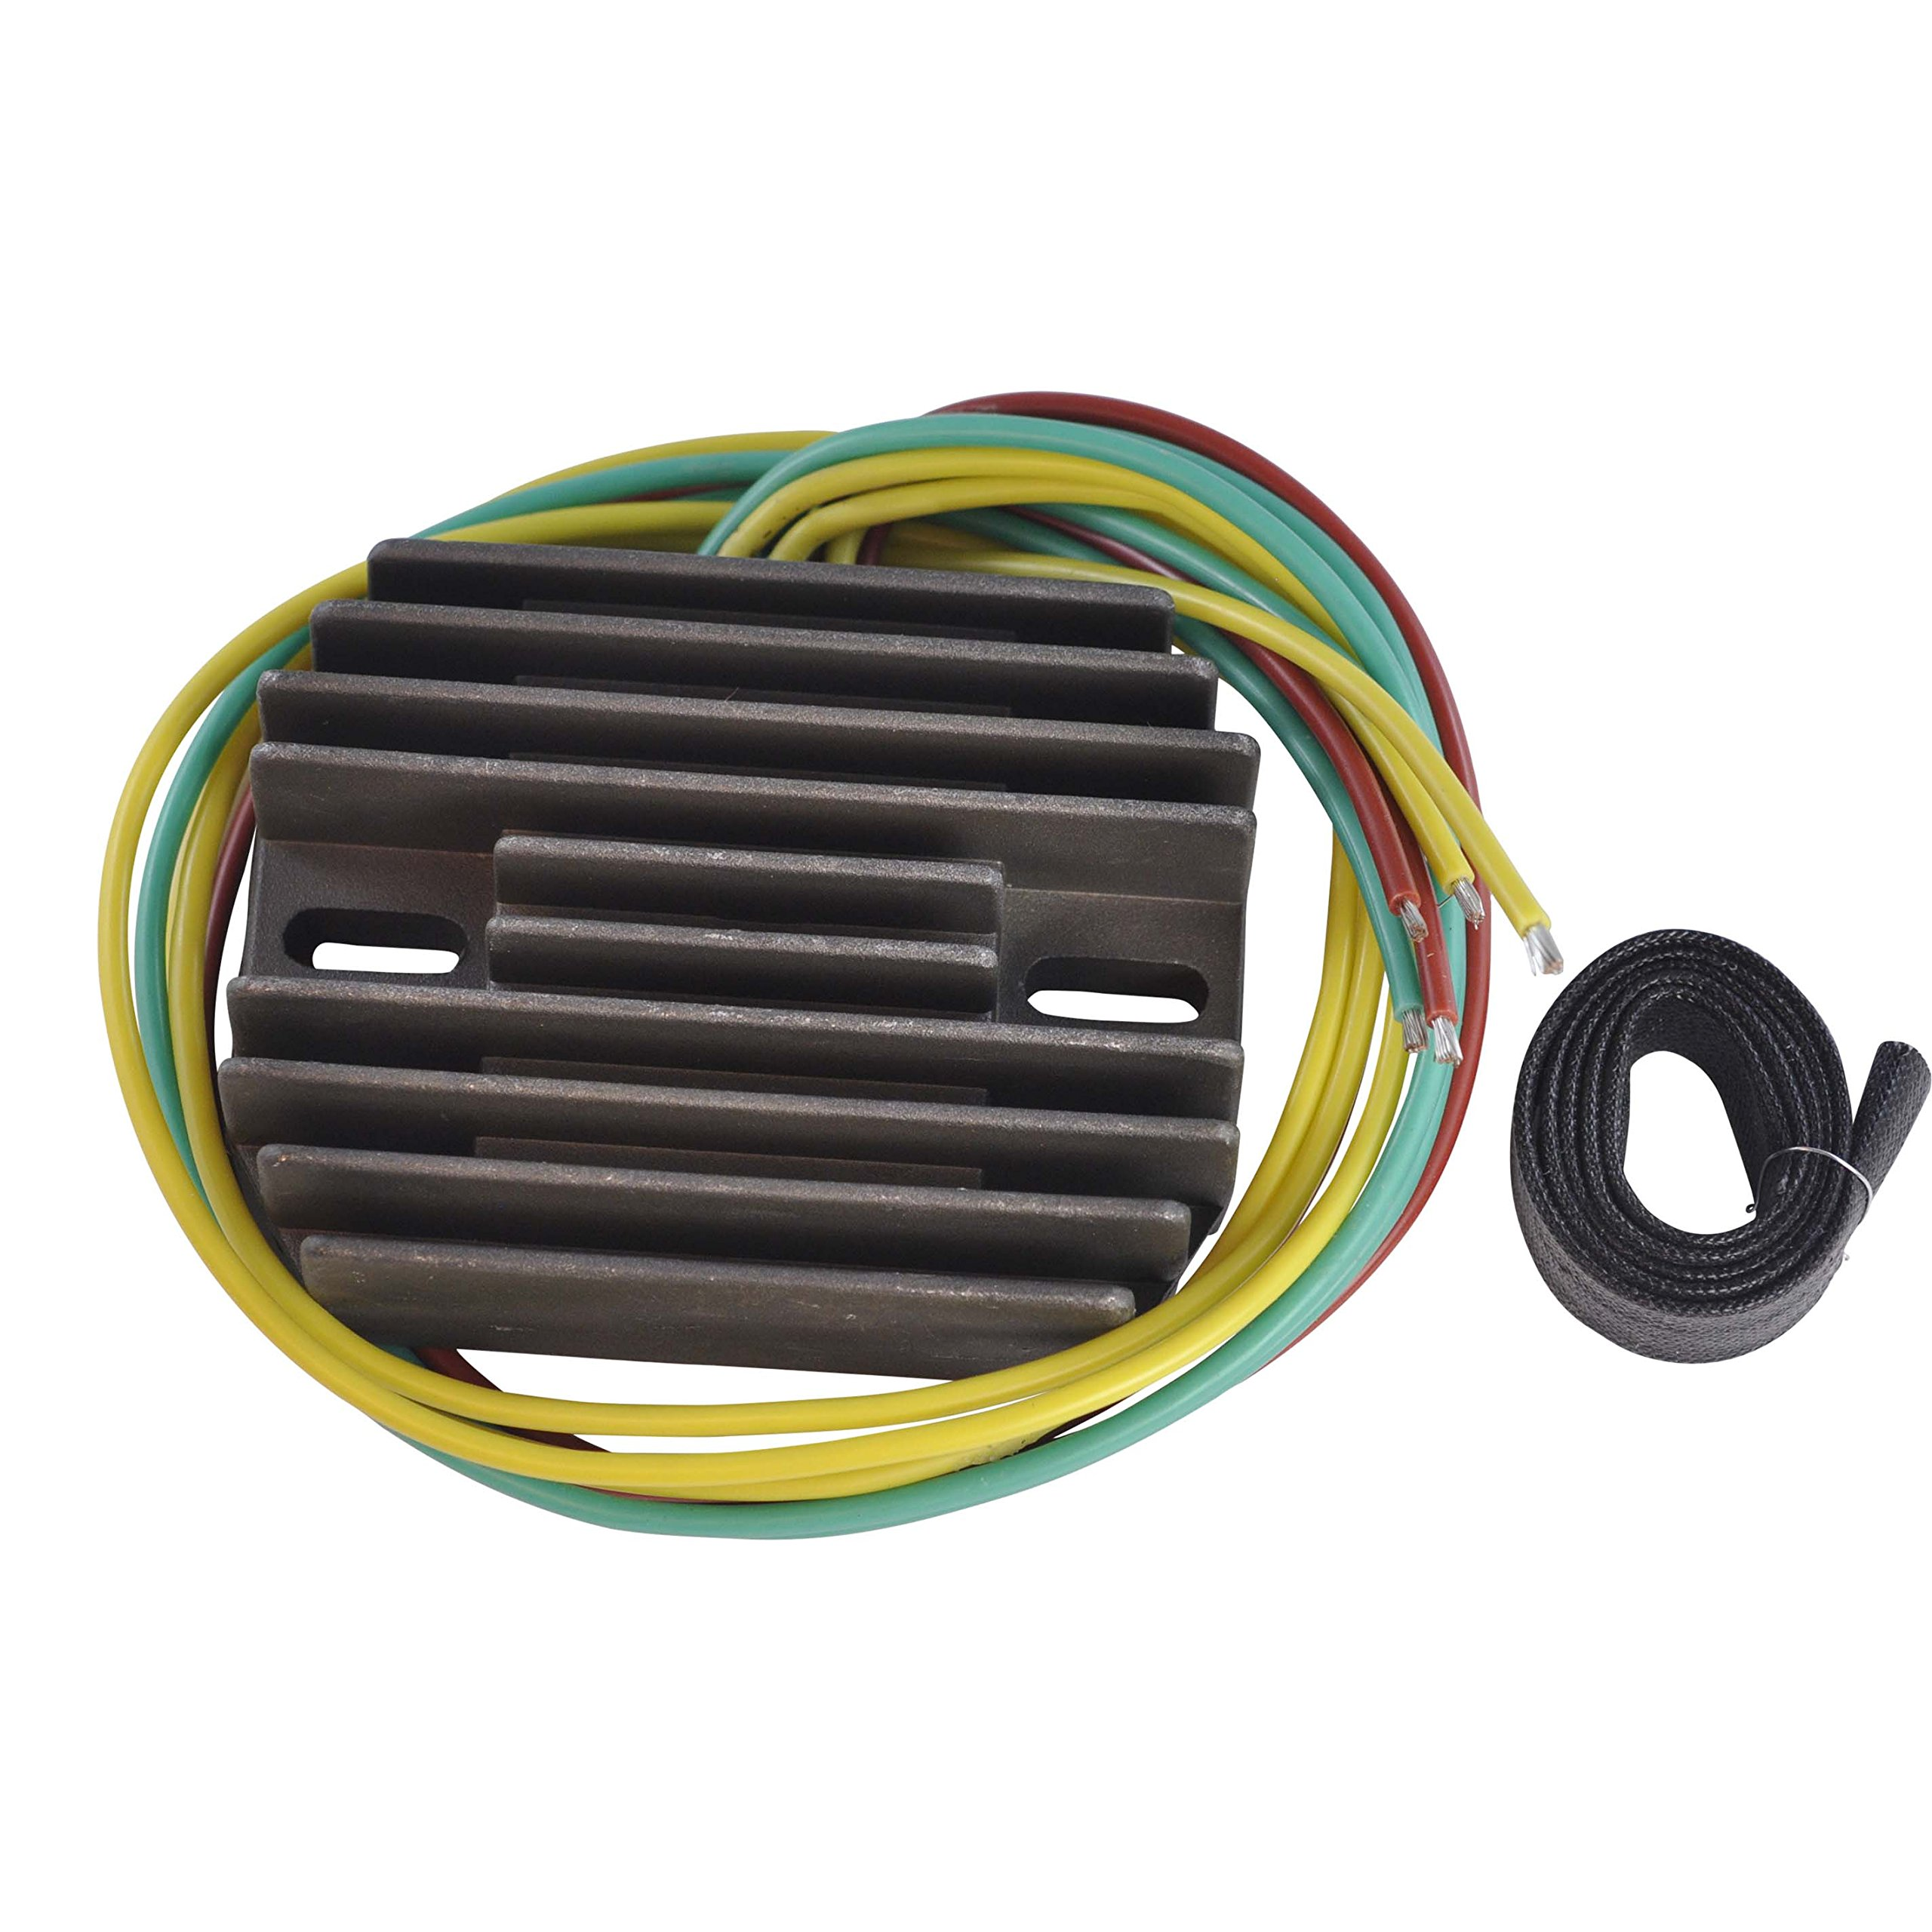 Voltage Regulator Rectifier For Arctic Cat EXT Pantera 580 / Honda CBR 1100 XX RVT 1000 VF Magna VFR VT 700-1100 / KTM 690 Enduro 950 / Suzuki 990 Supermoto R T 1983-2016